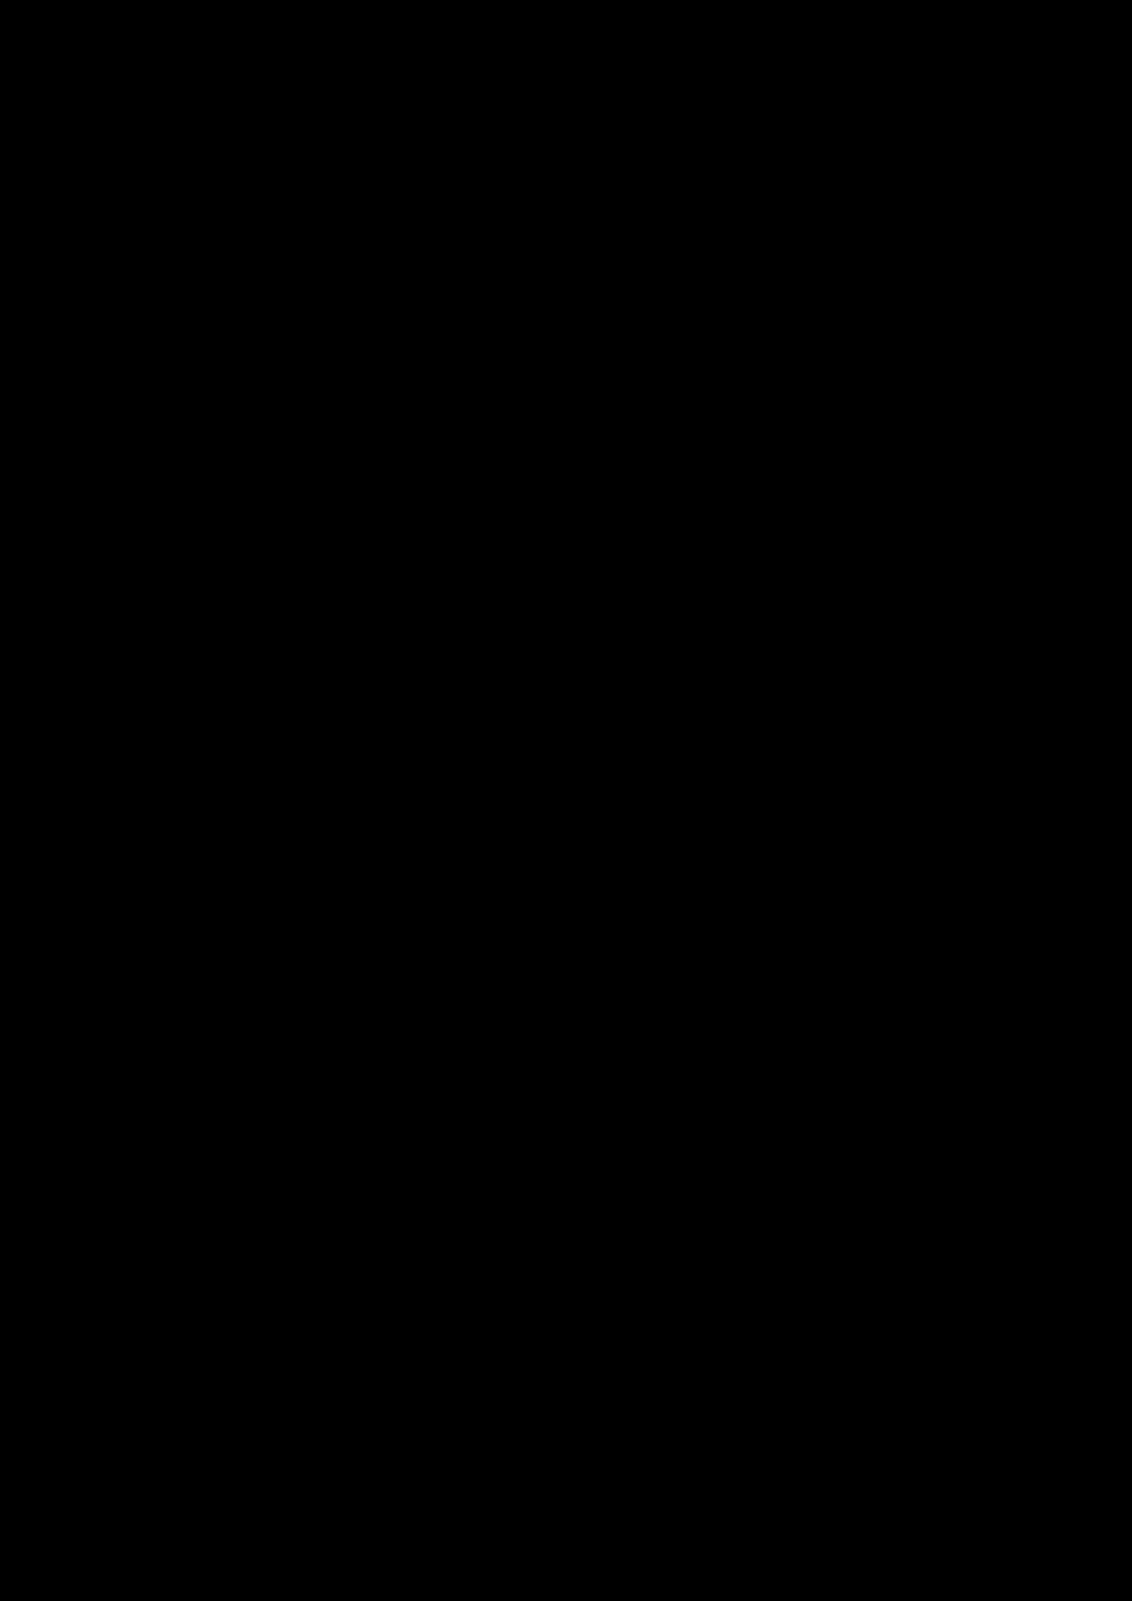 Belyiy sokol slide, Image 20